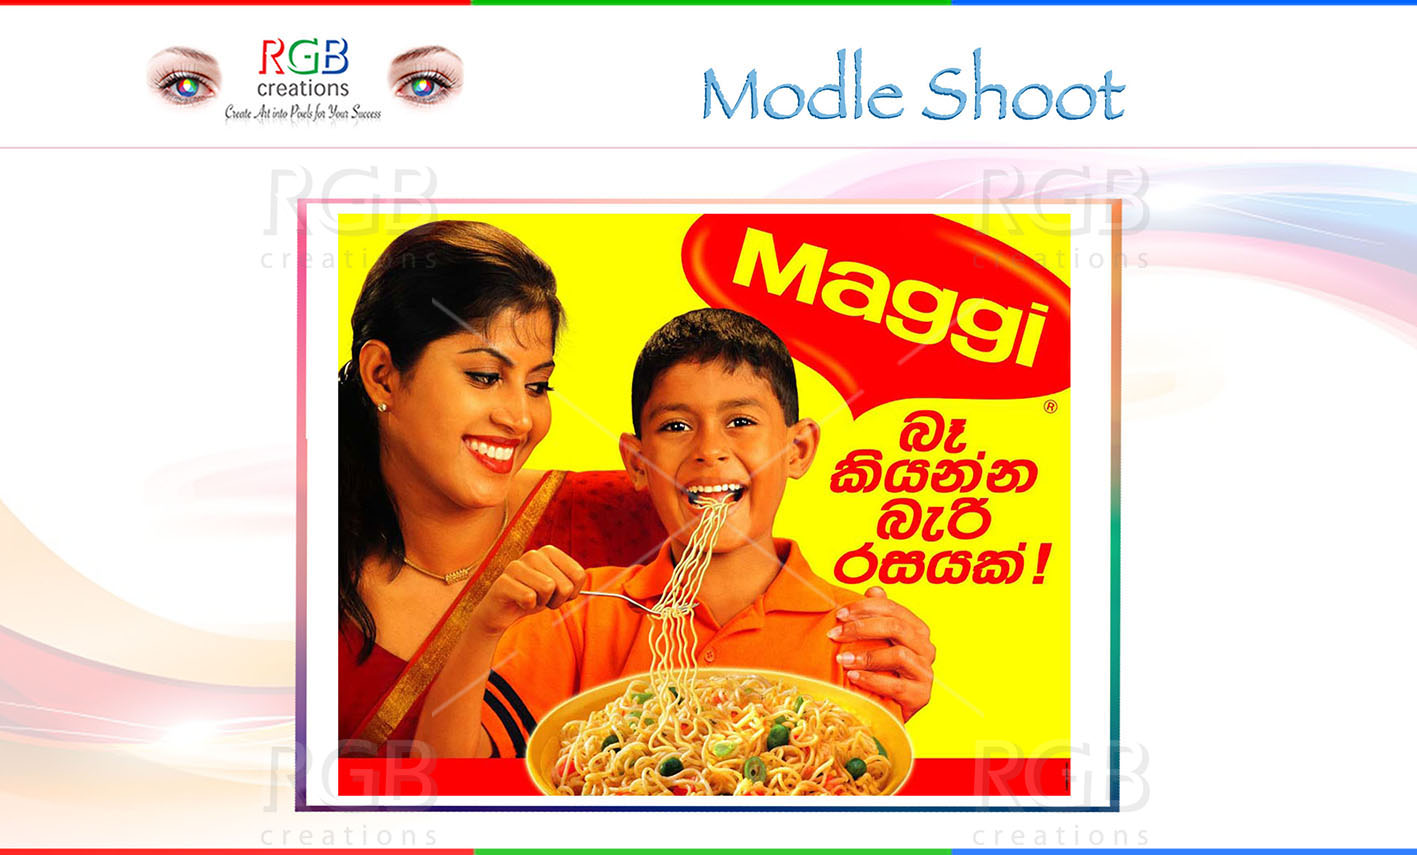 Maggi Product Shoot